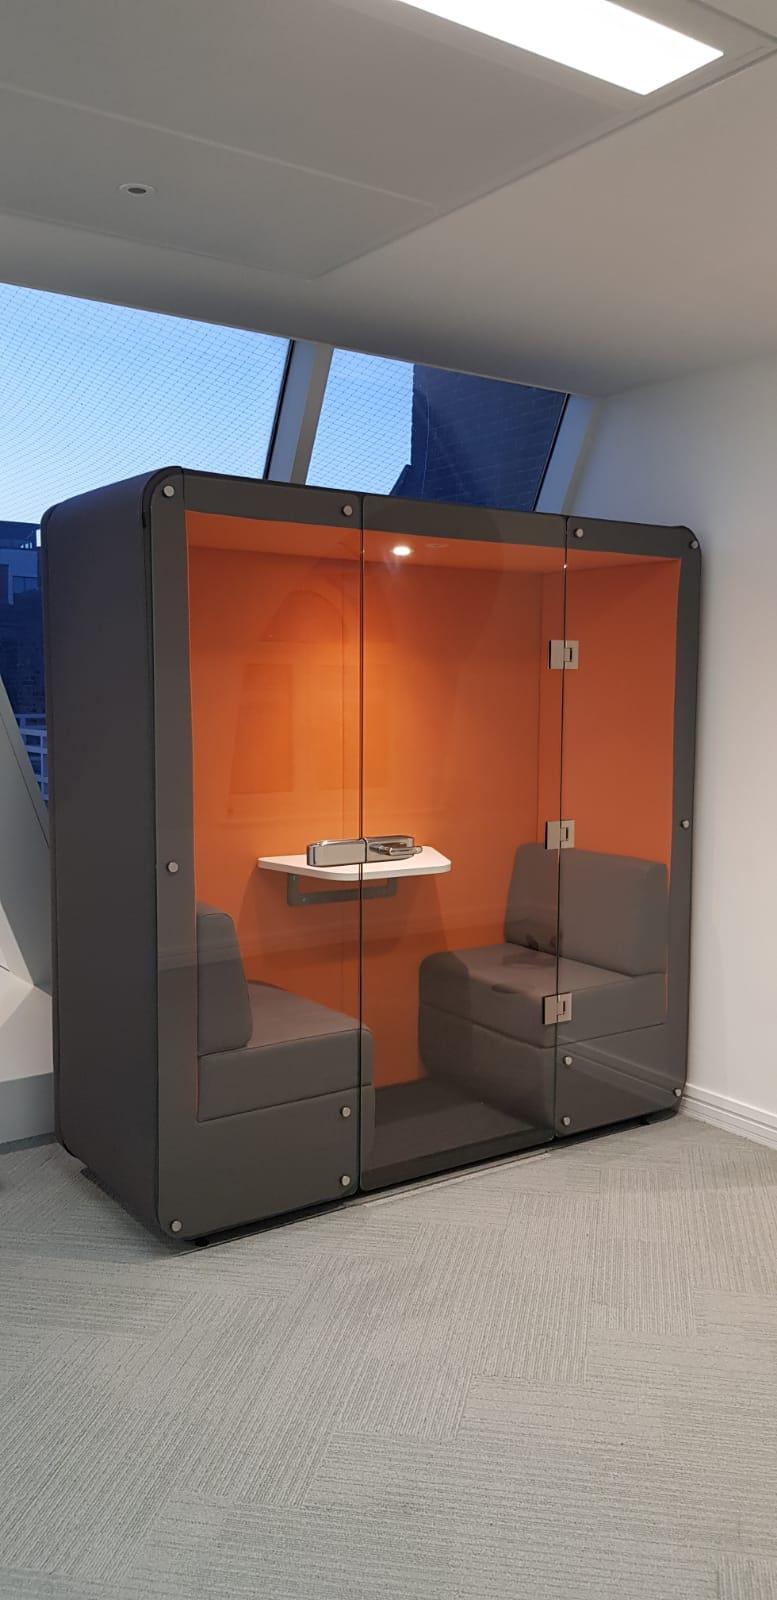 2 Person Booth - BOB.jpg